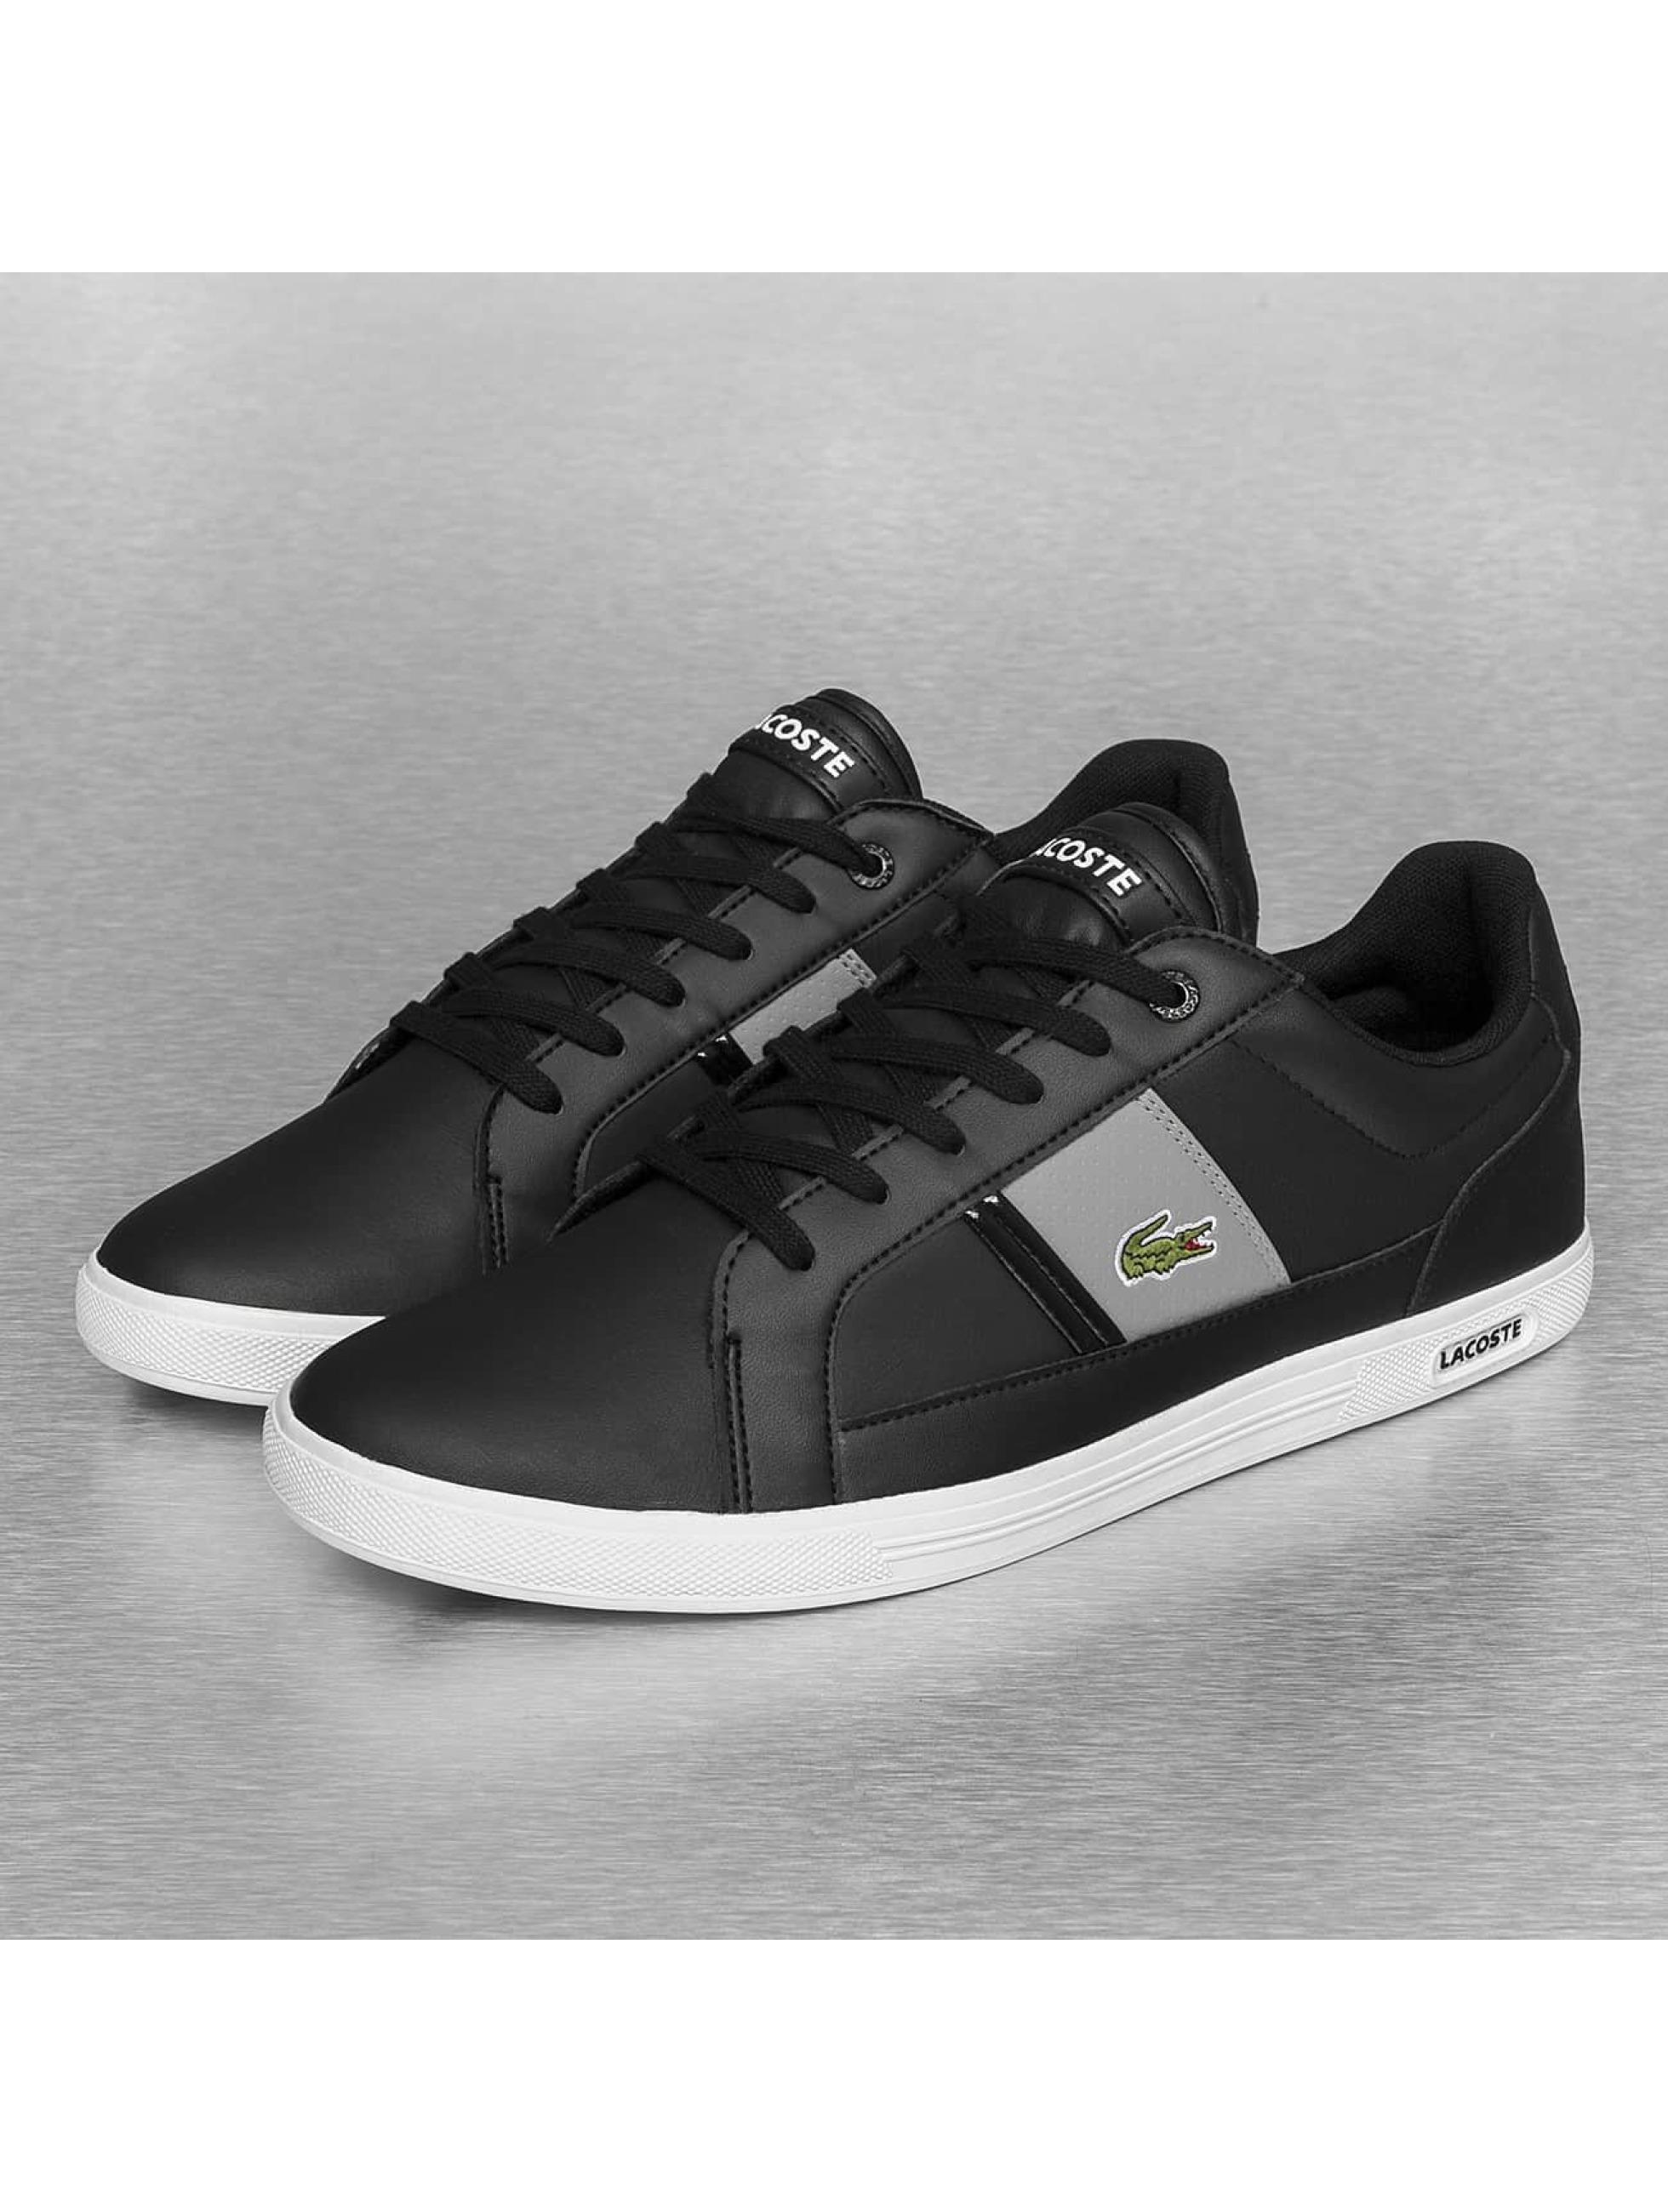 lacoste herren sneaker europa lcr3 spm in schwarz 255202. Black Bedroom Furniture Sets. Home Design Ideas